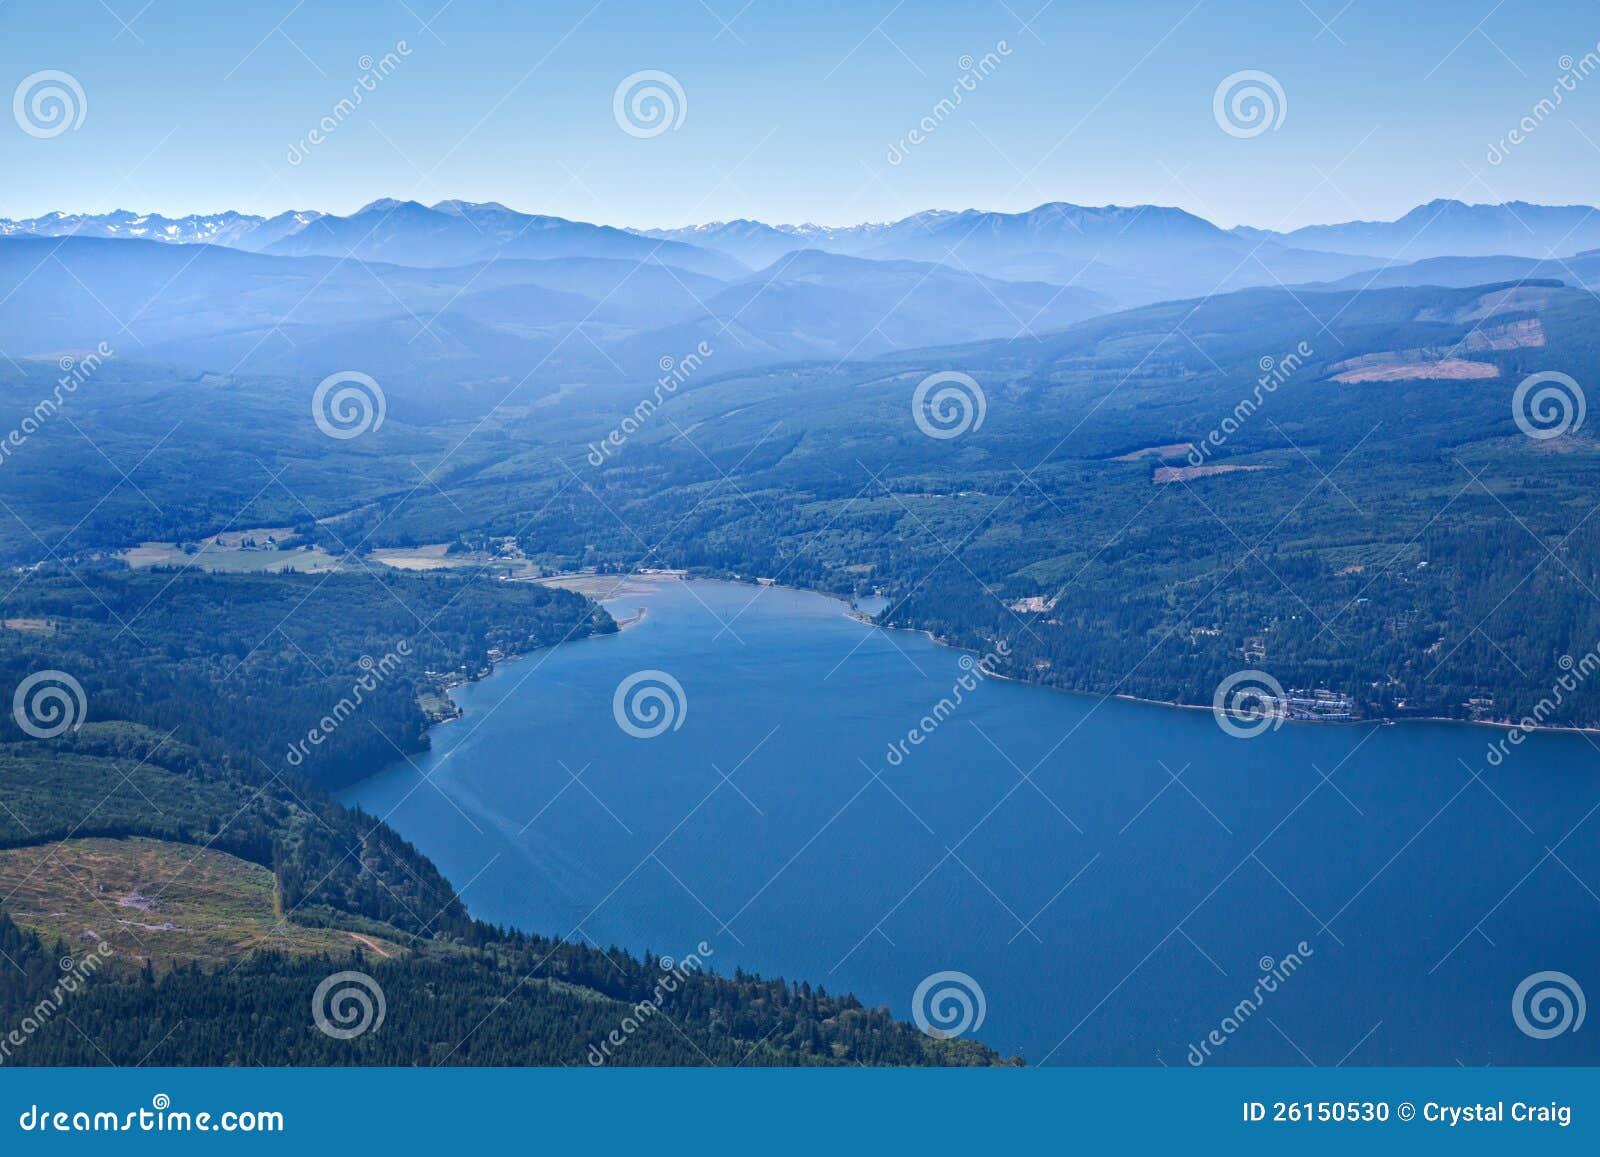 Discovery Bay Washington State Stock Photo Image Of Calm Range 26150530